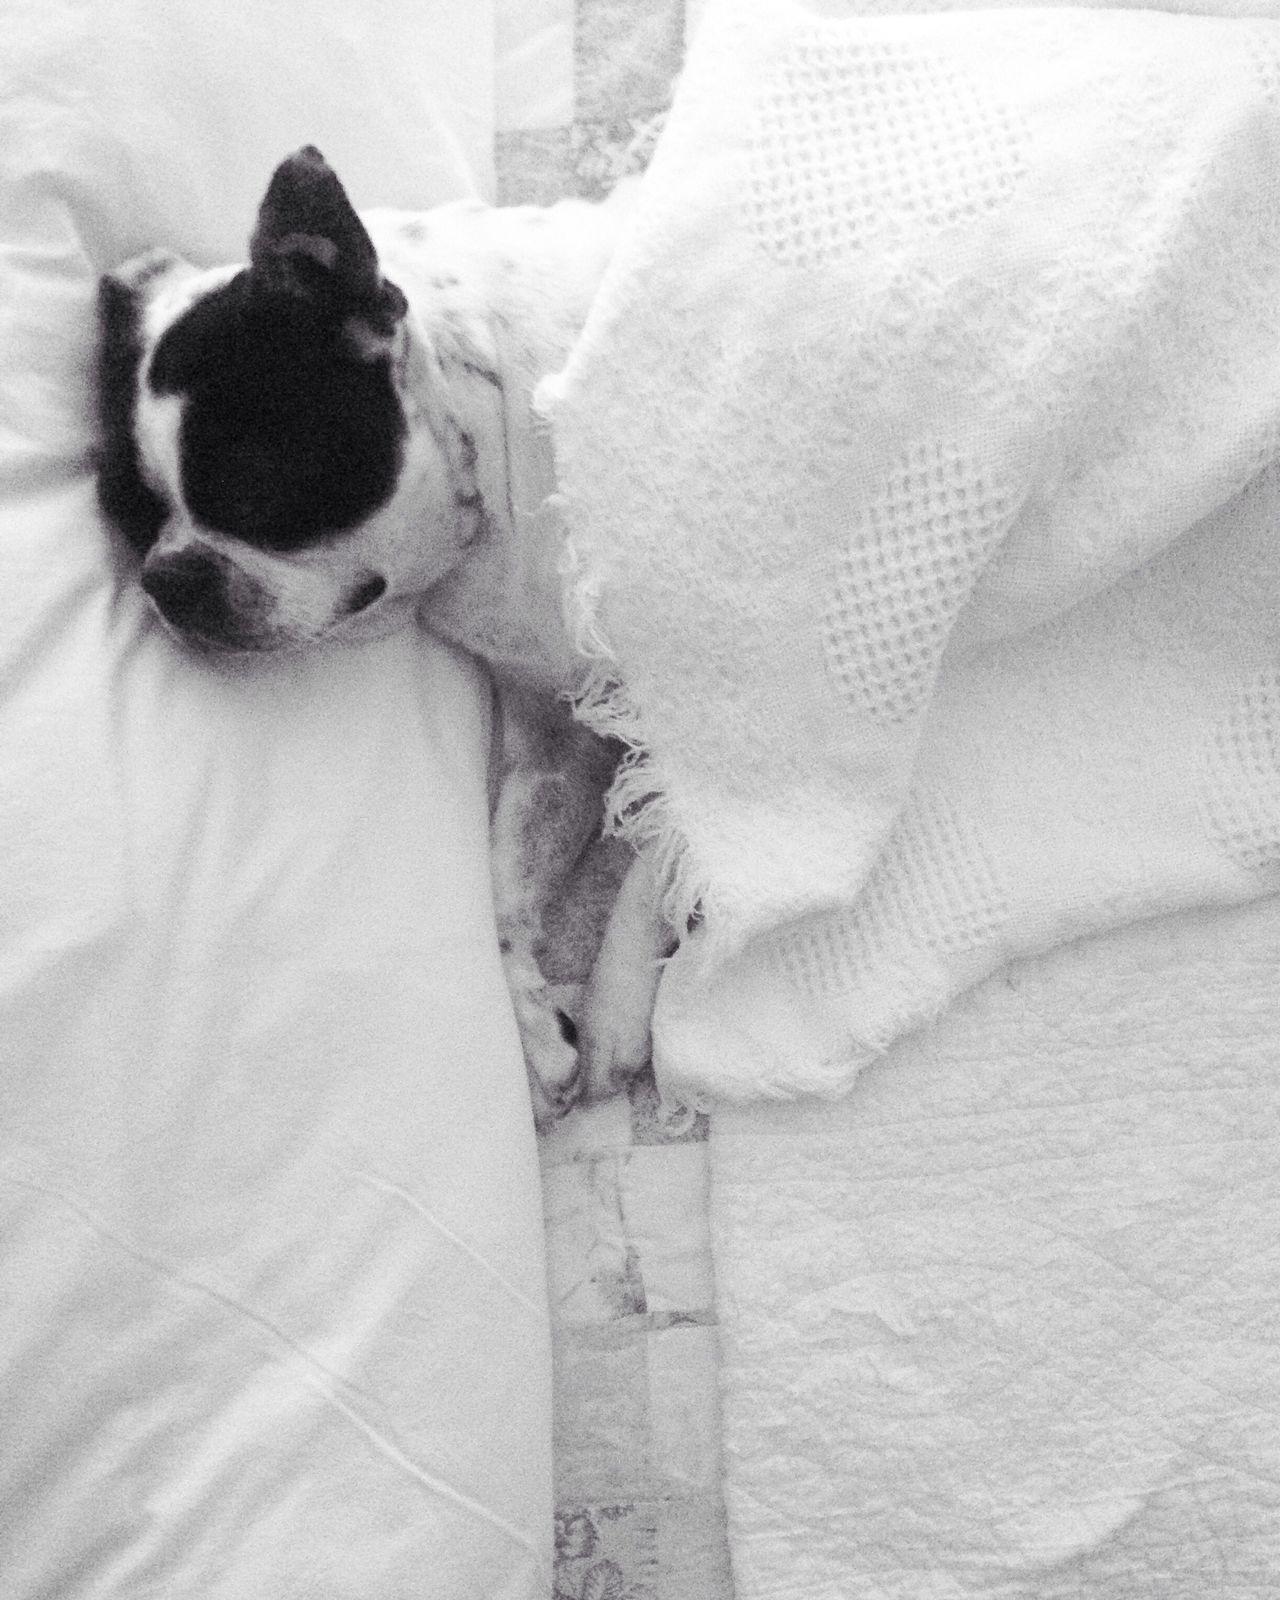 Dormir Sleep Perro Dog Boston Terrier